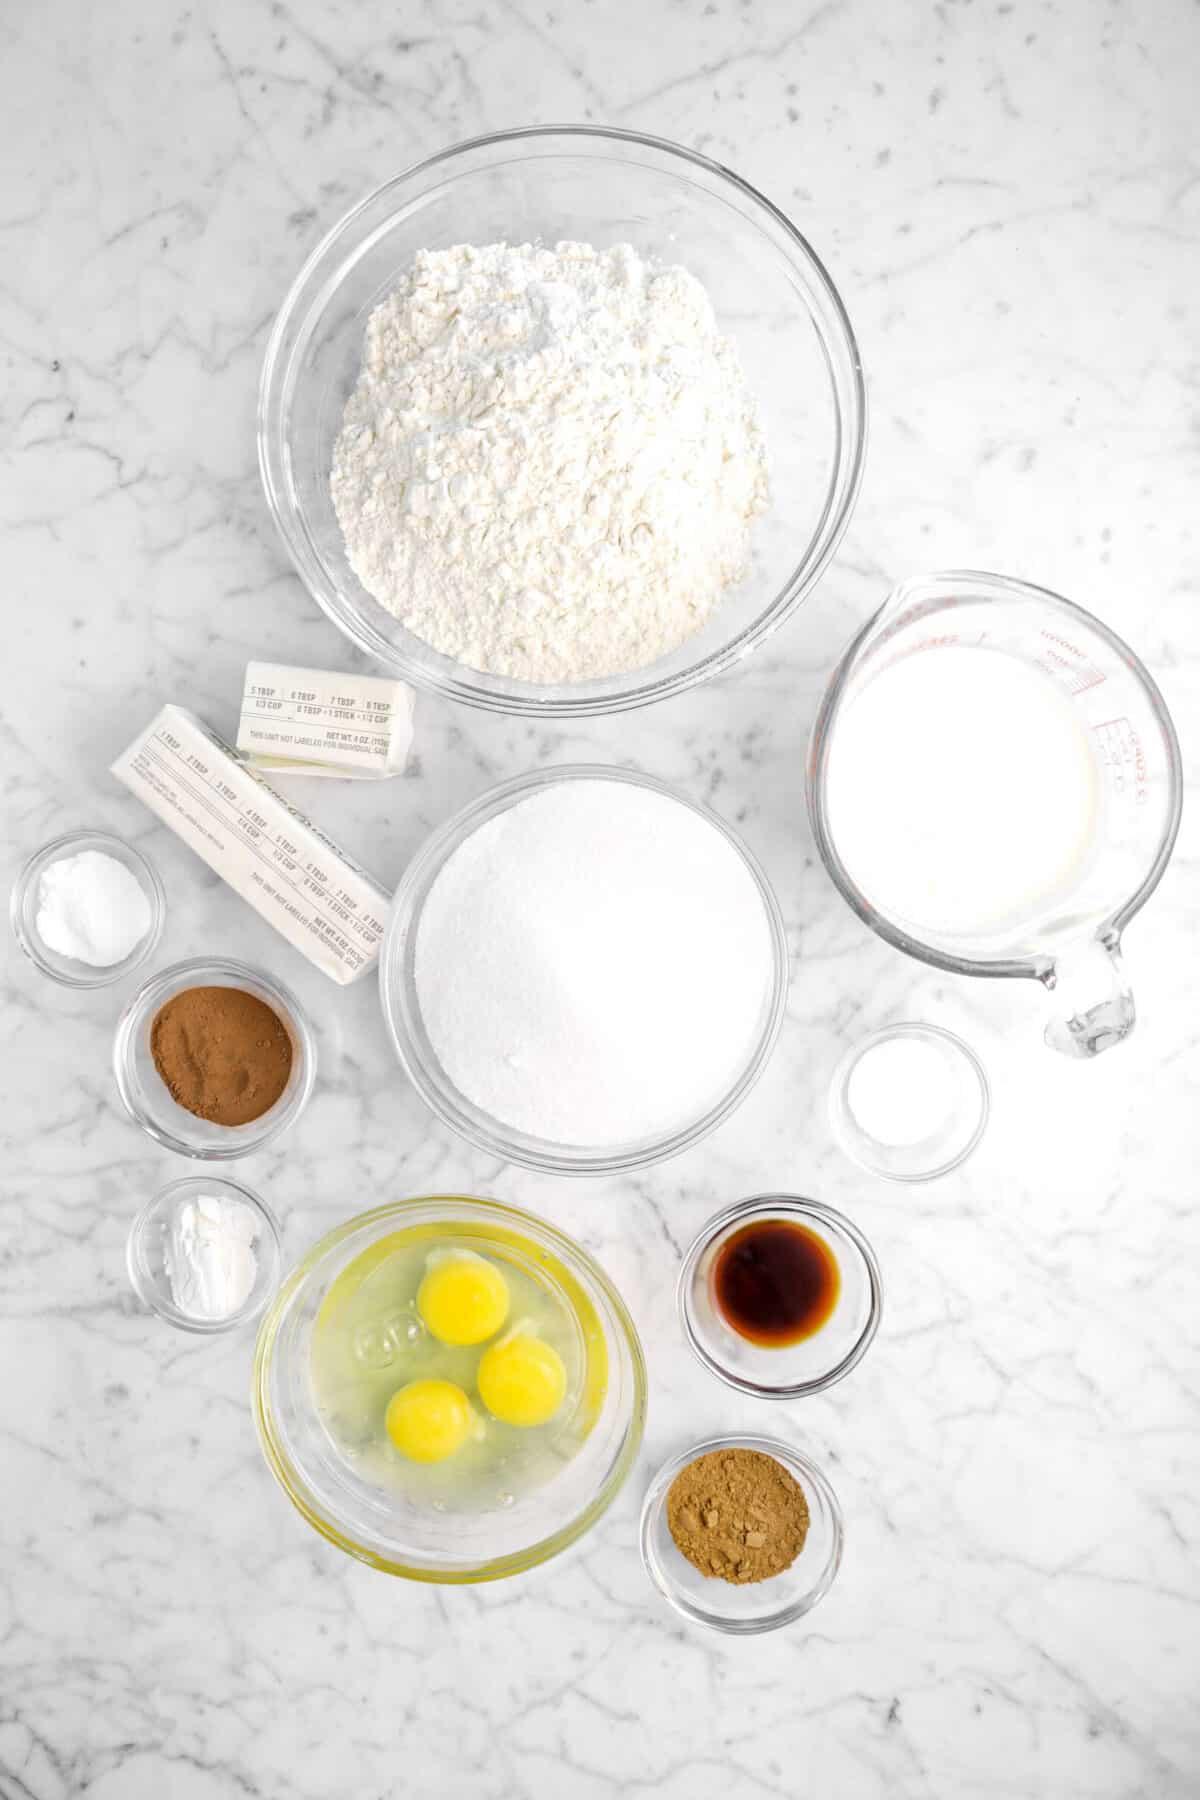 flour, butter, baking soda, cocoa, baking powder, sugar, eggs, milk, salt, vanilla, and pumpkin pie spice on marble counter